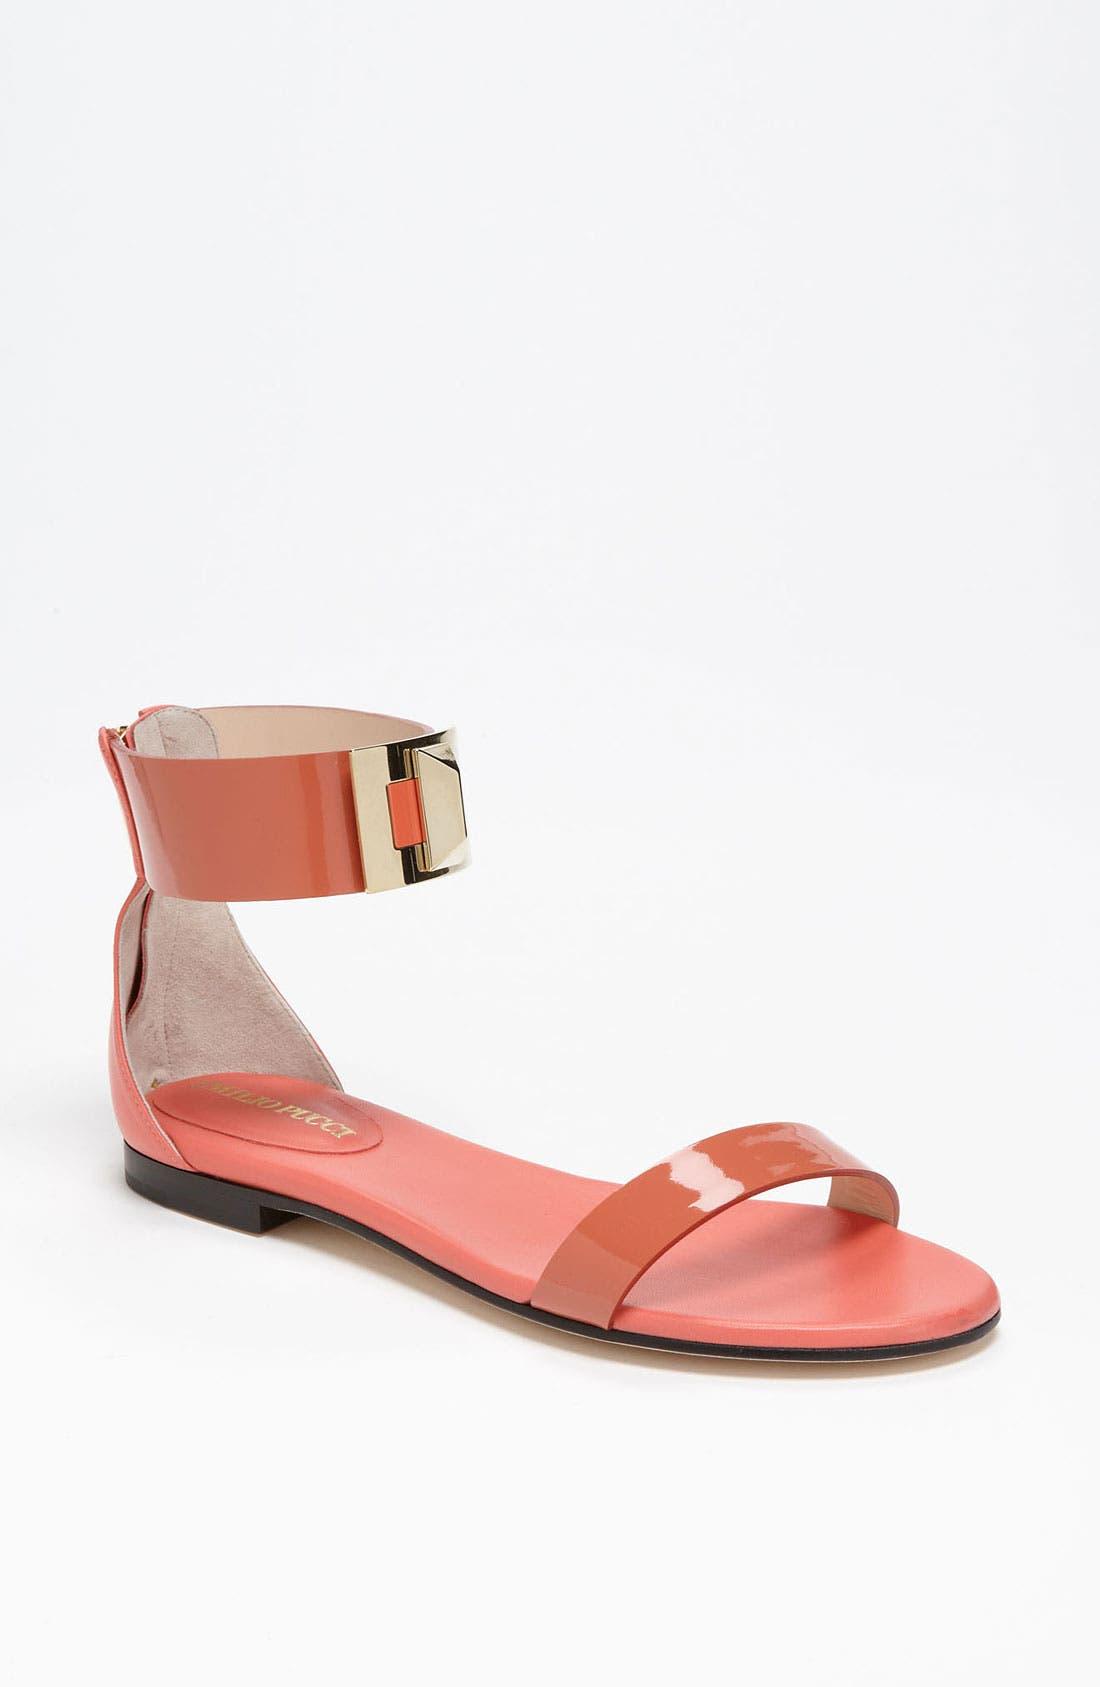 Main Image - Emilio Pucci 'Marquise' Flat Sandal